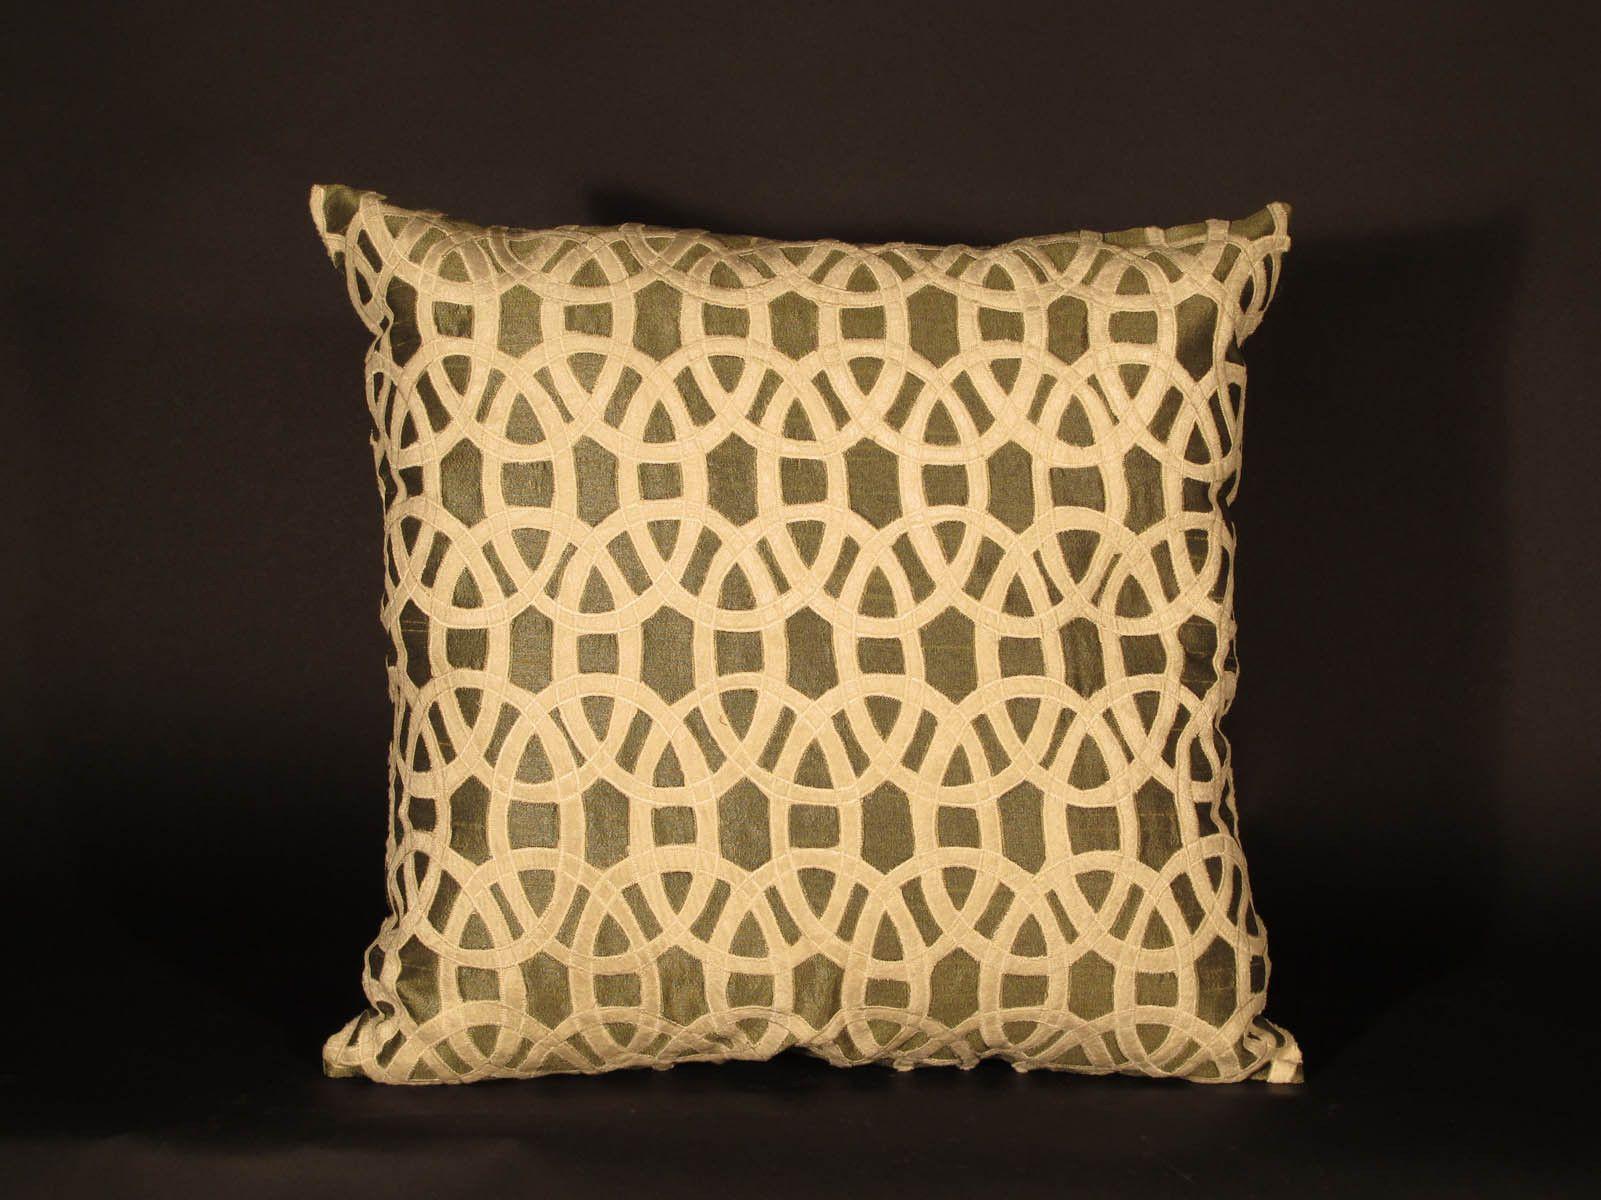 Embroidered Cushion Cover Iznik Design Olive - Cream - 46 x 46 (wxdxh cms) - A3951V8NP